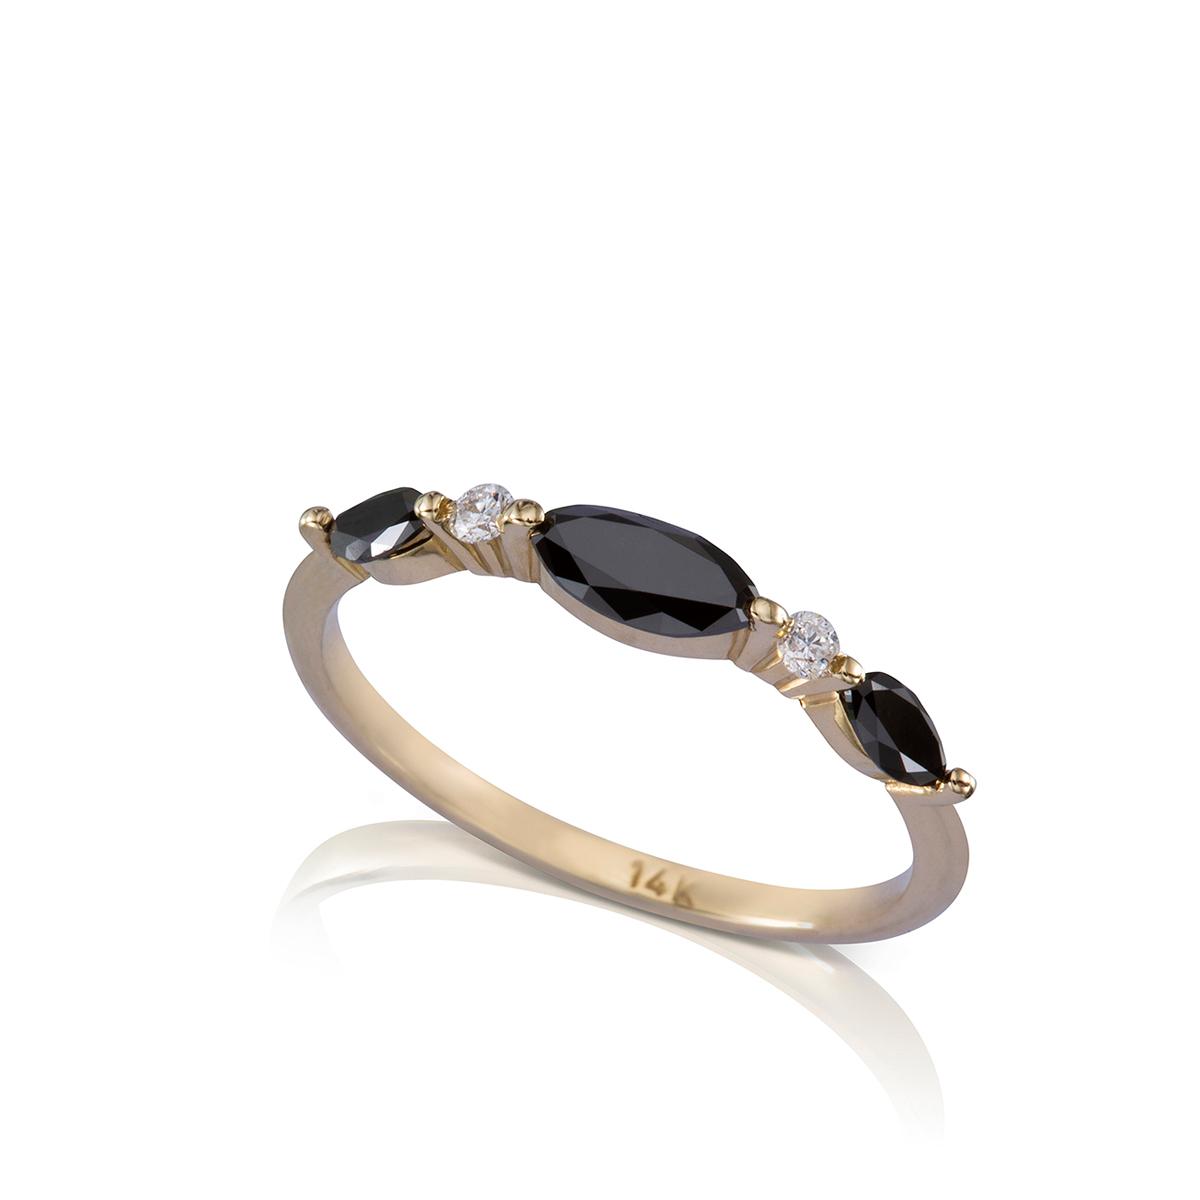 Marquise-cut black diamond  with brilliant white diamonds ring